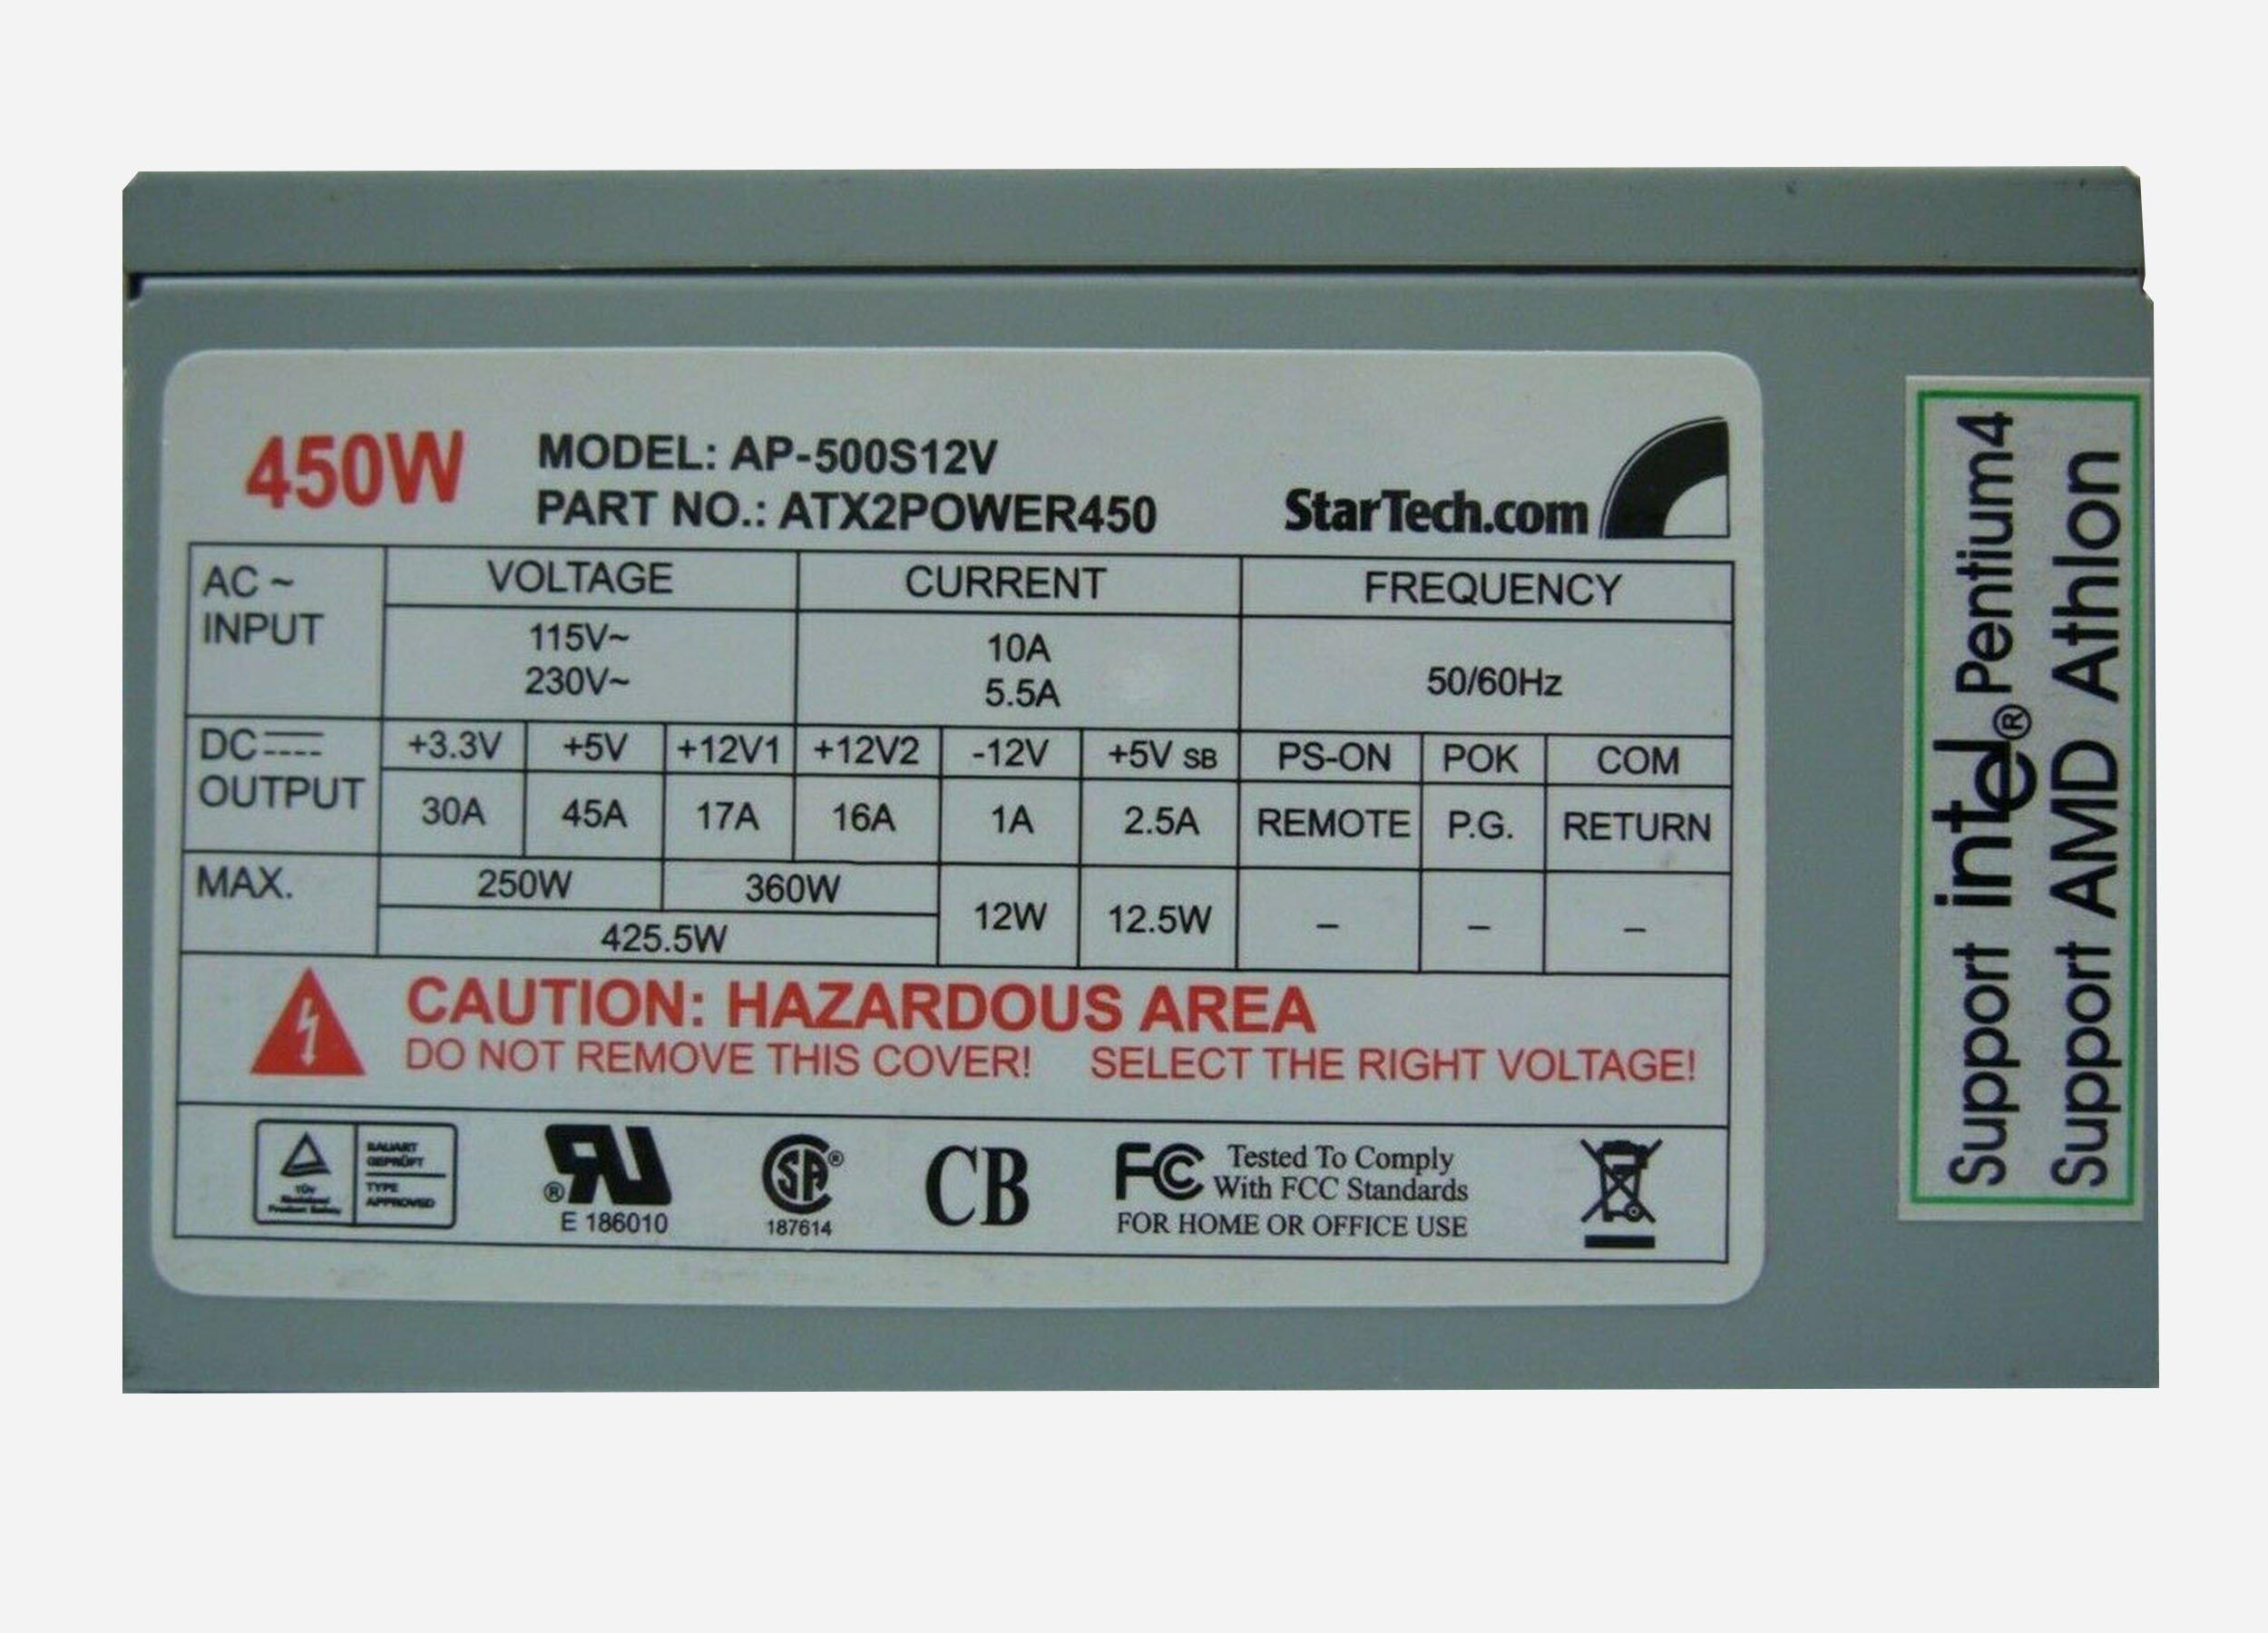 StarTech AP 500S12V Power Supply